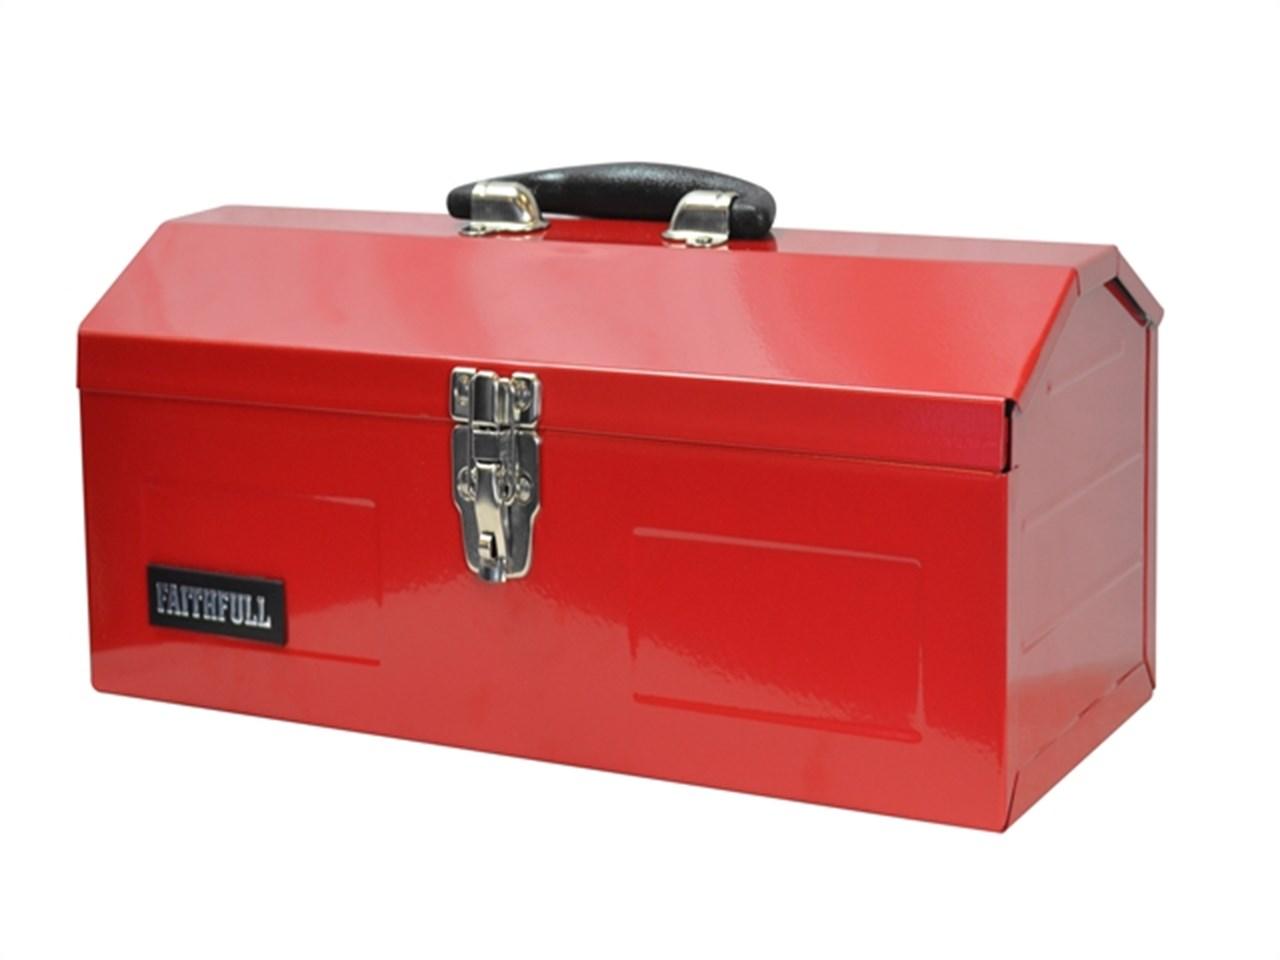 faithfull faitbb16 metal barn tool box 42cm 16in